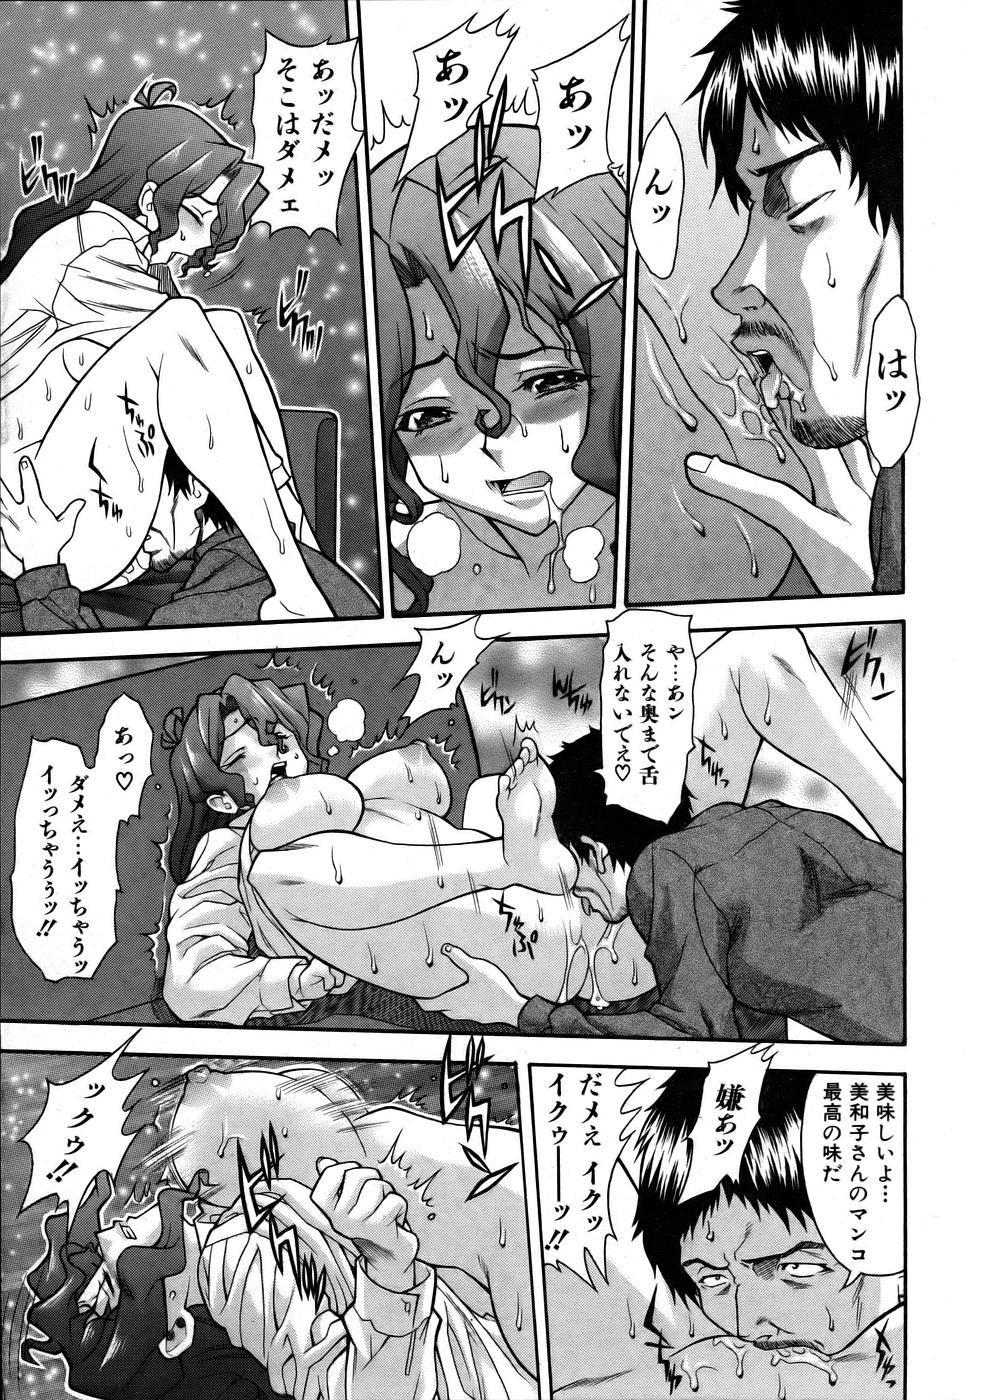 COMIC AUN 2005-10 Vol. 113 146